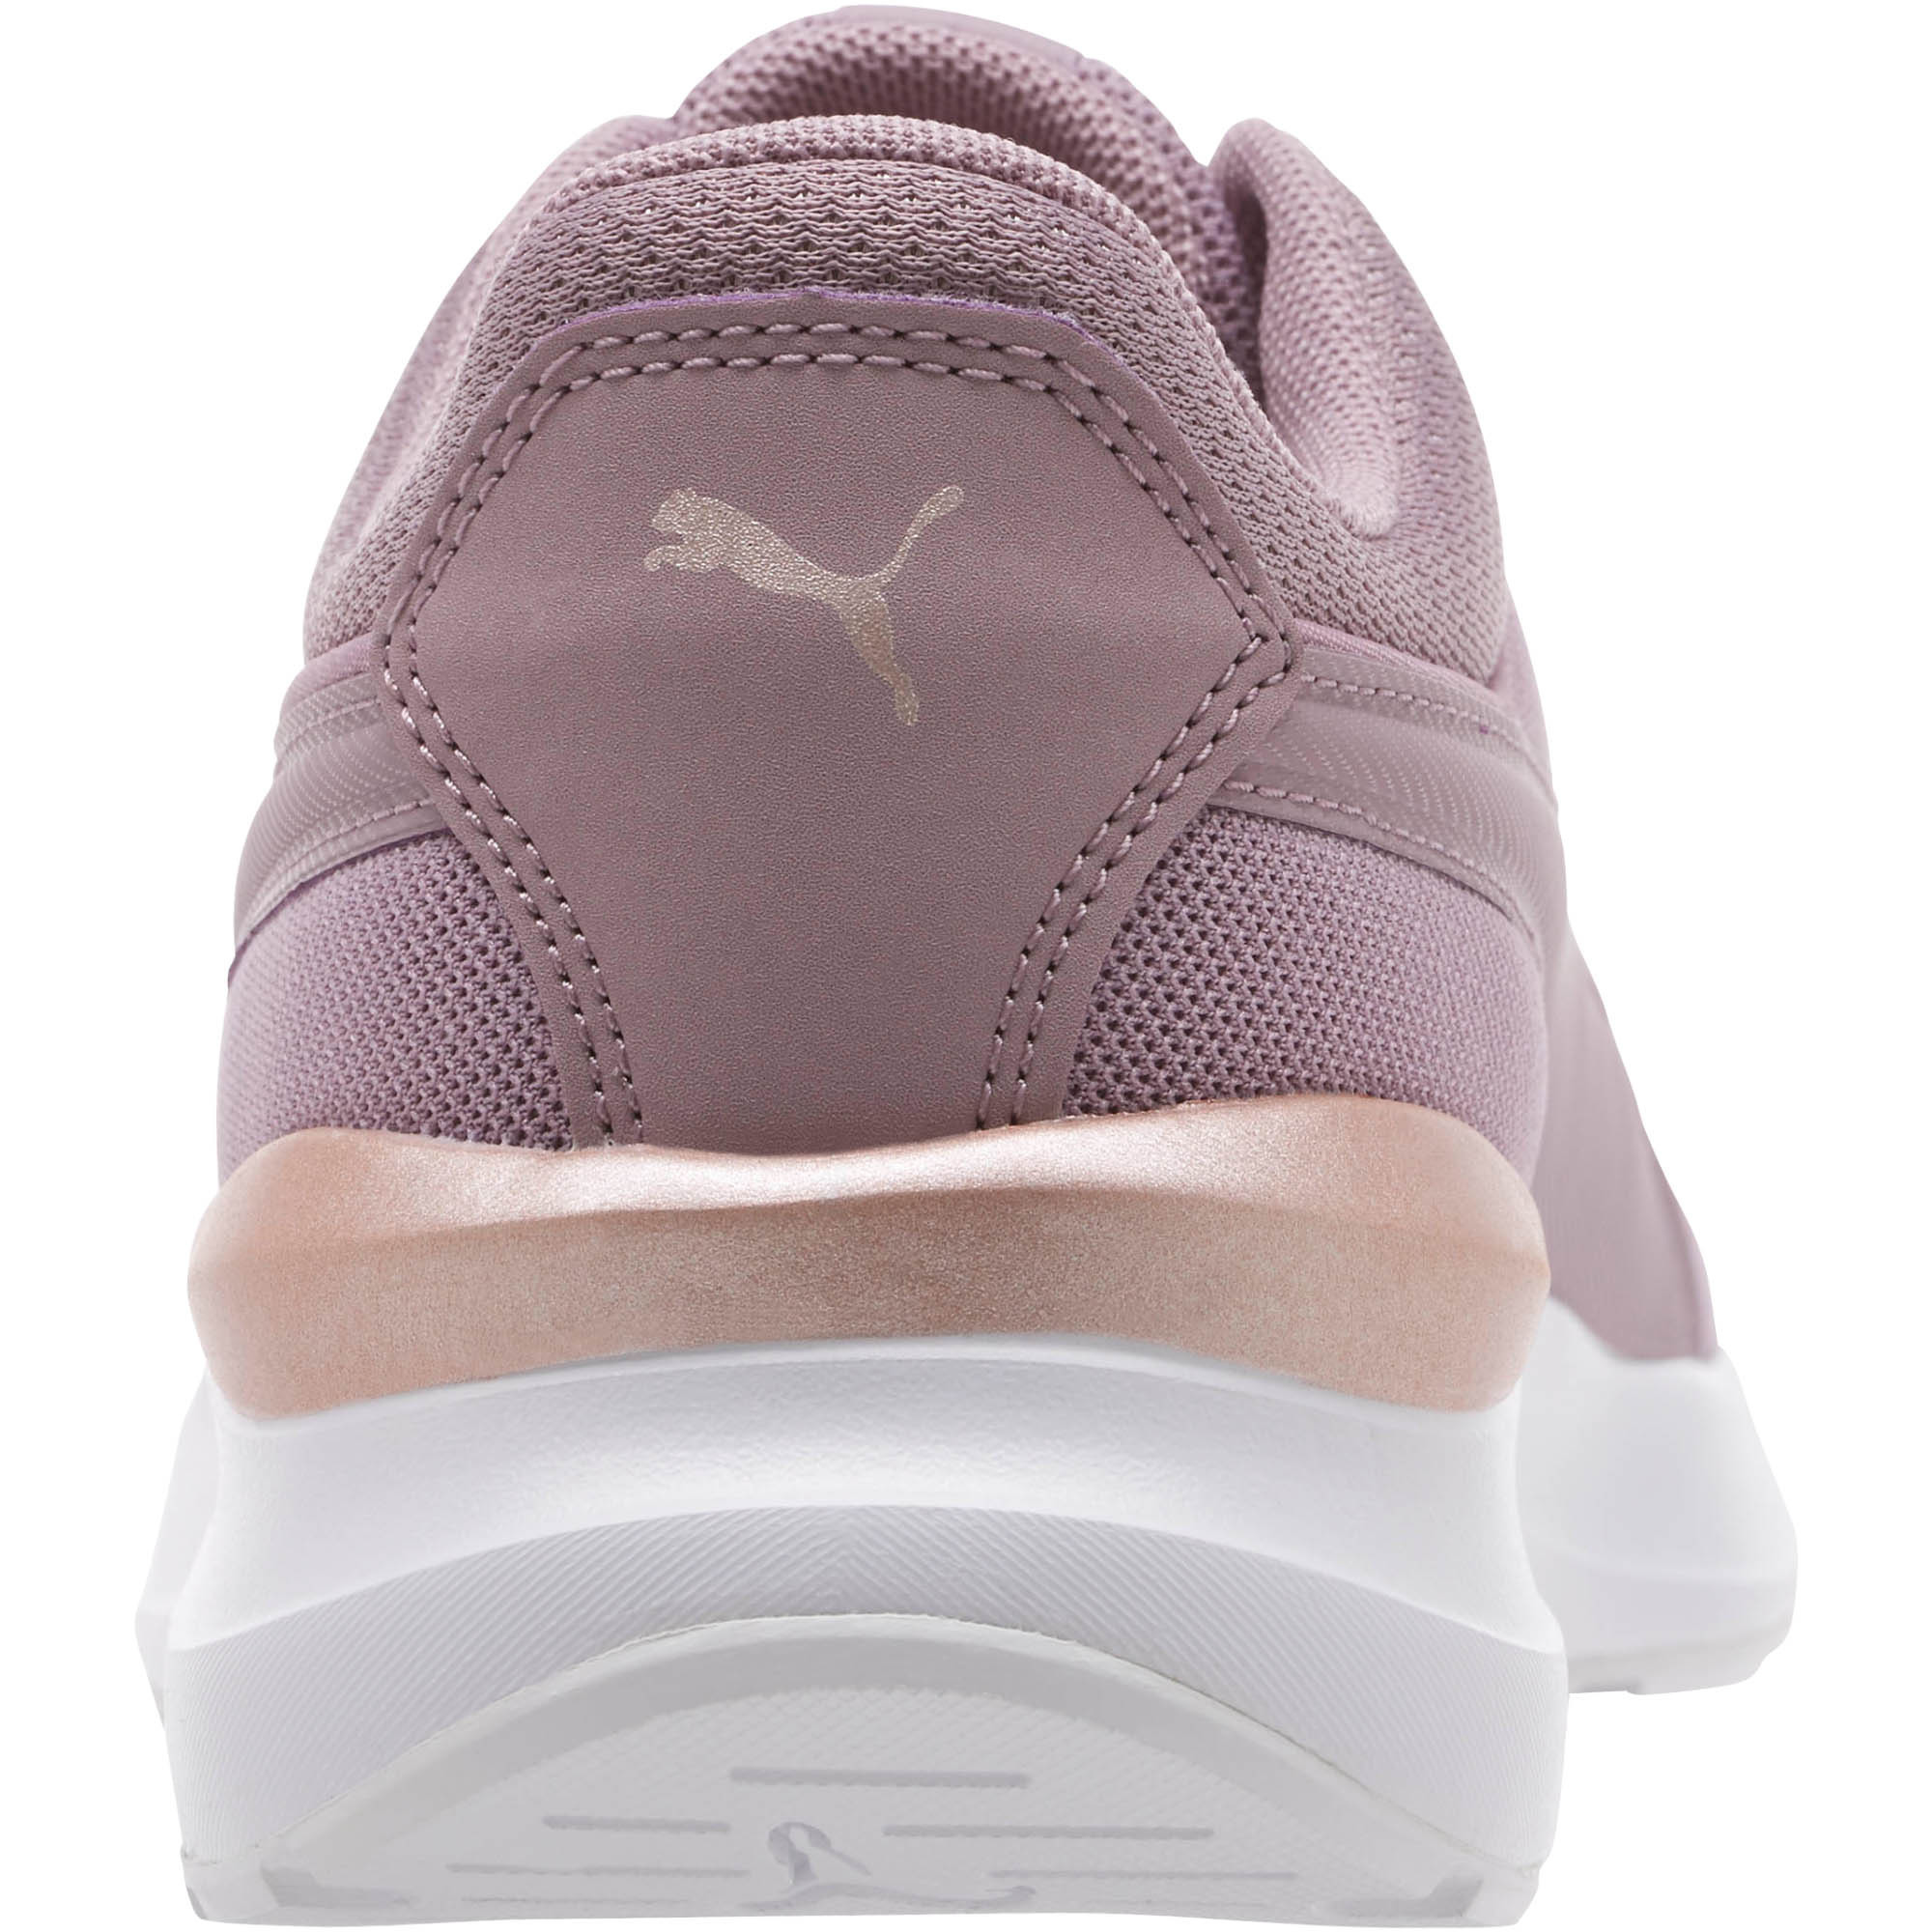 PUMA-Adela-Mesh-Women-s-Sneakers-Women-Shoe-Basics thumbnail 3